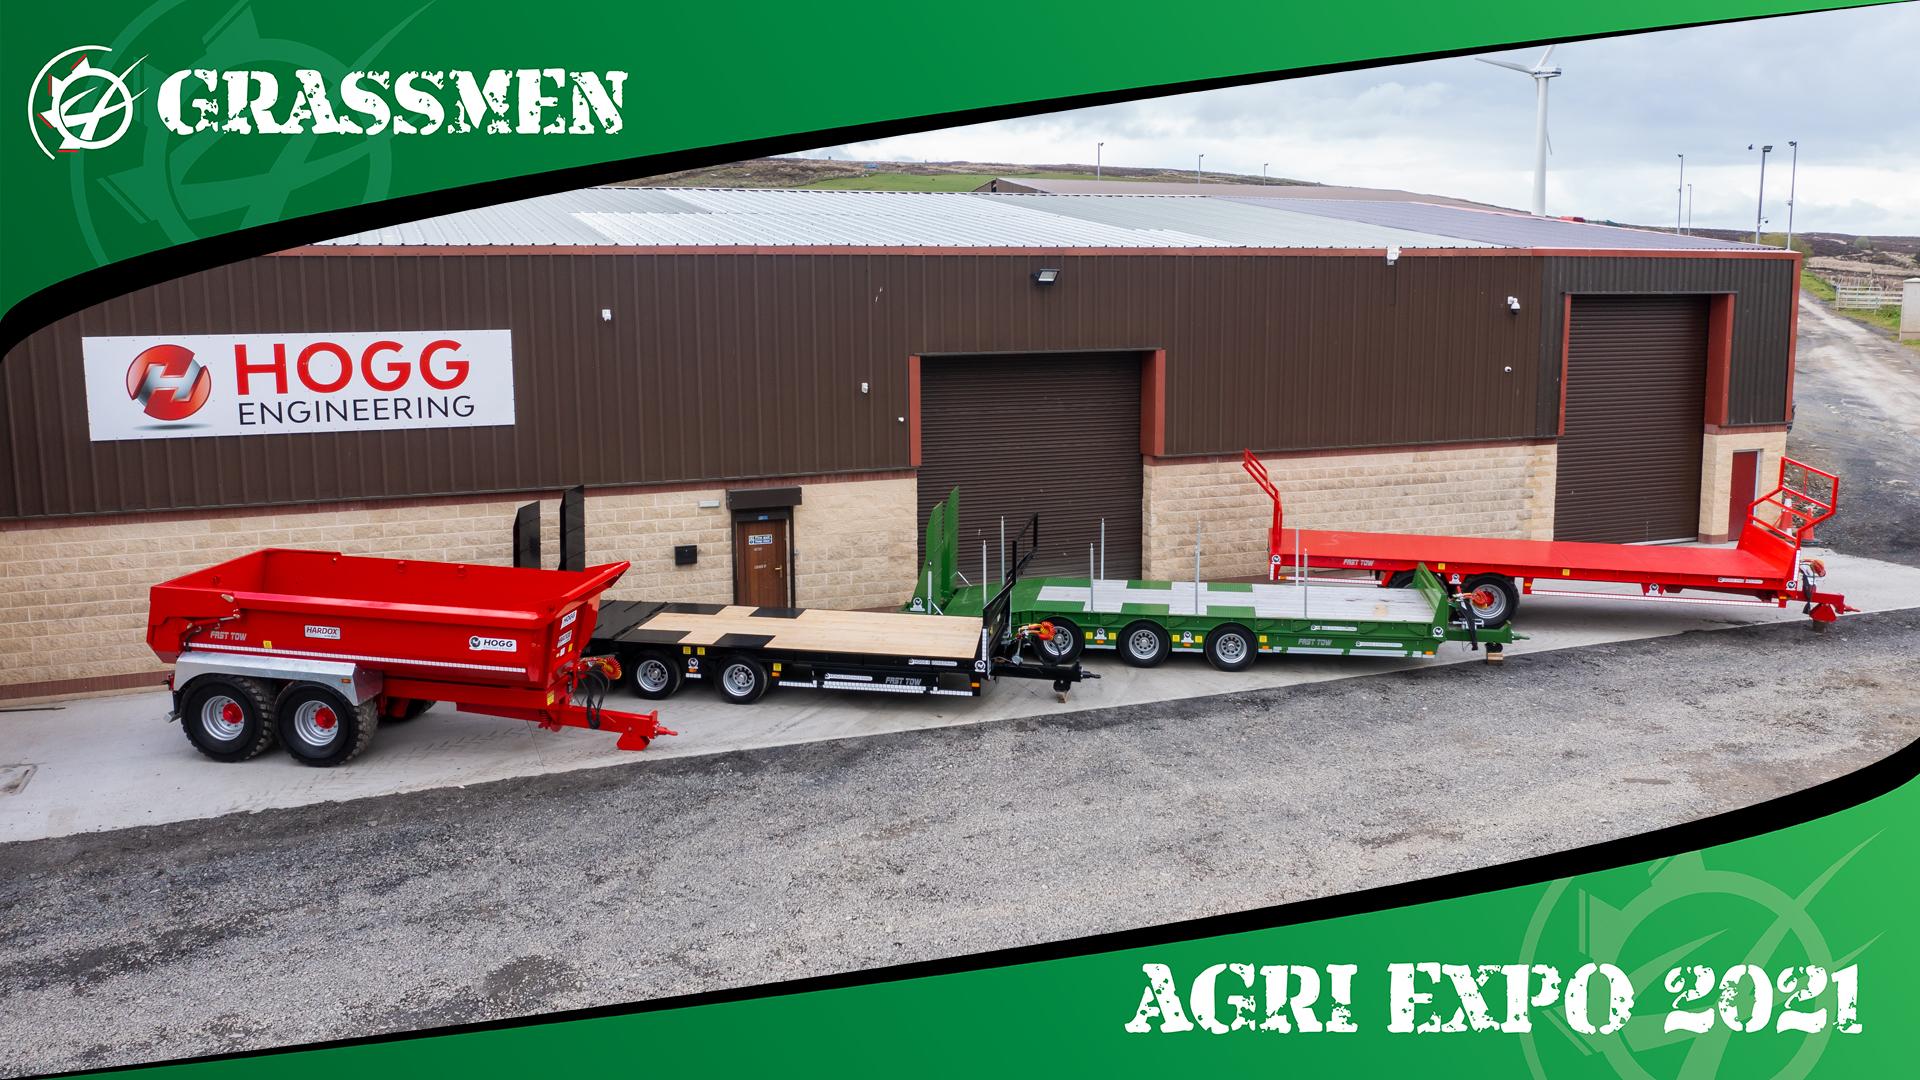 HOGG ENGINEERING - GRASSMEN AGRI EXPO DAY 3